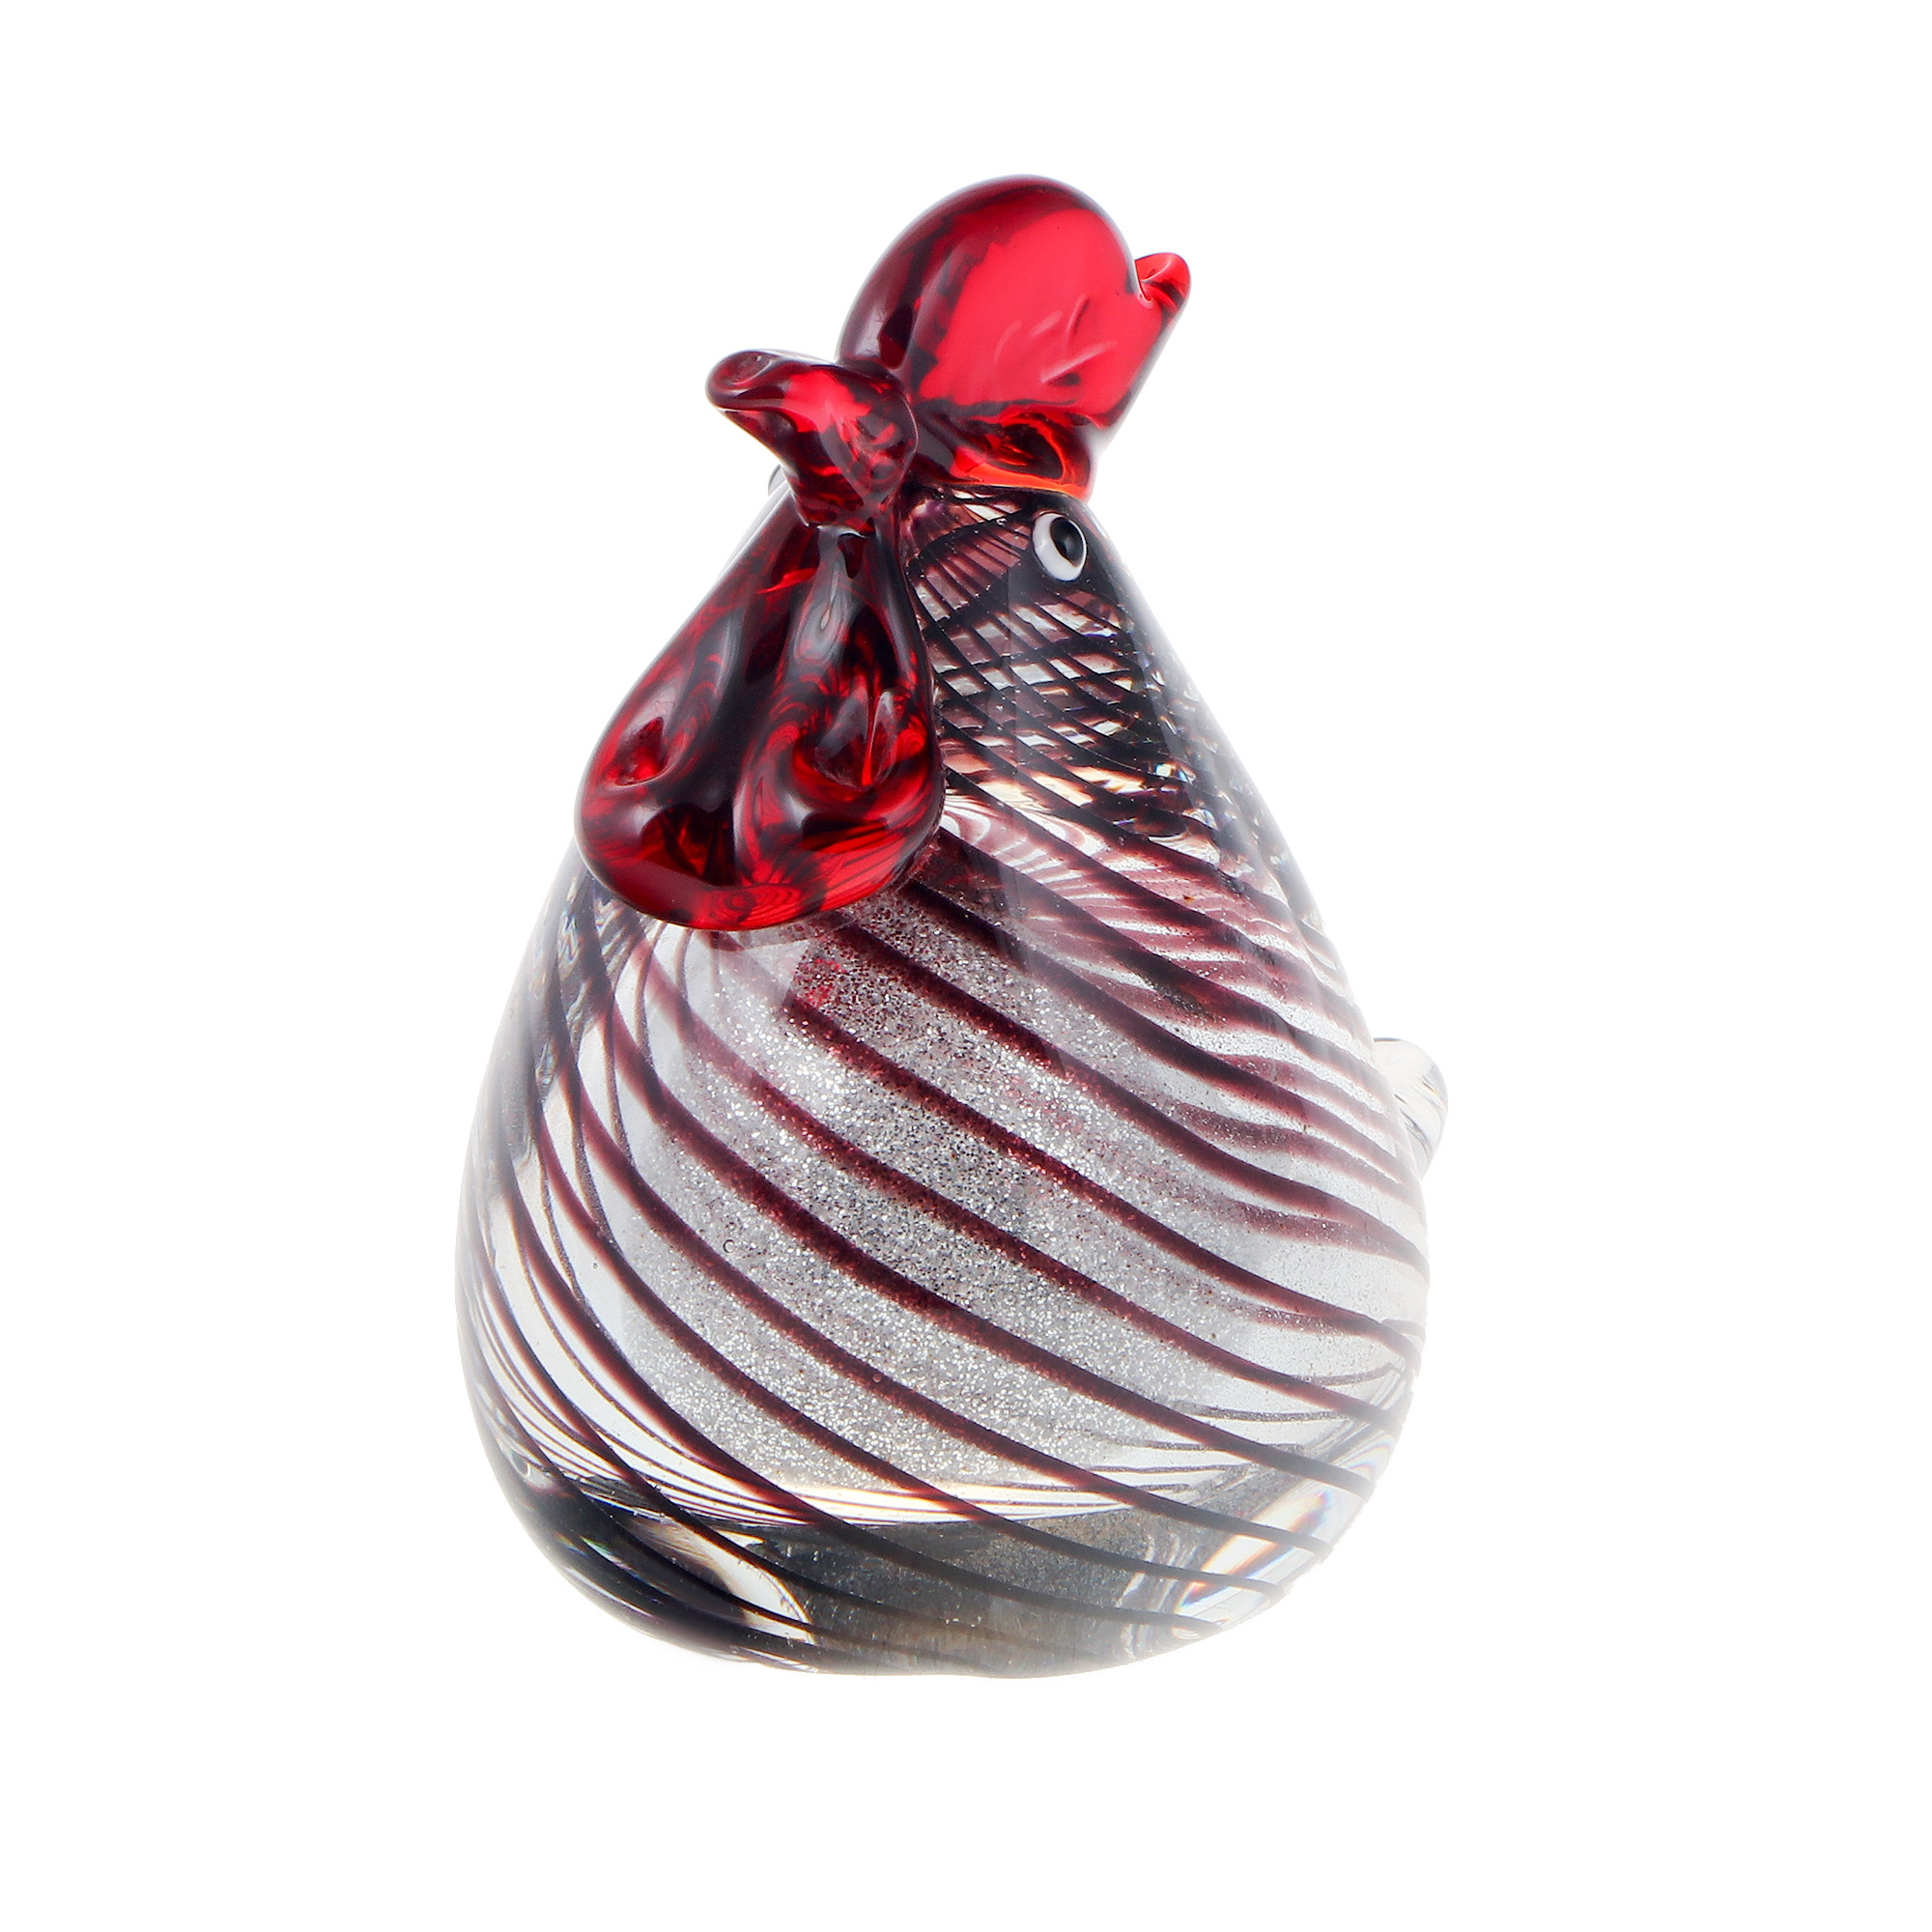 Фигурка Art glass курочка 11x12 см фигурка art glass пеликан 22х26 см